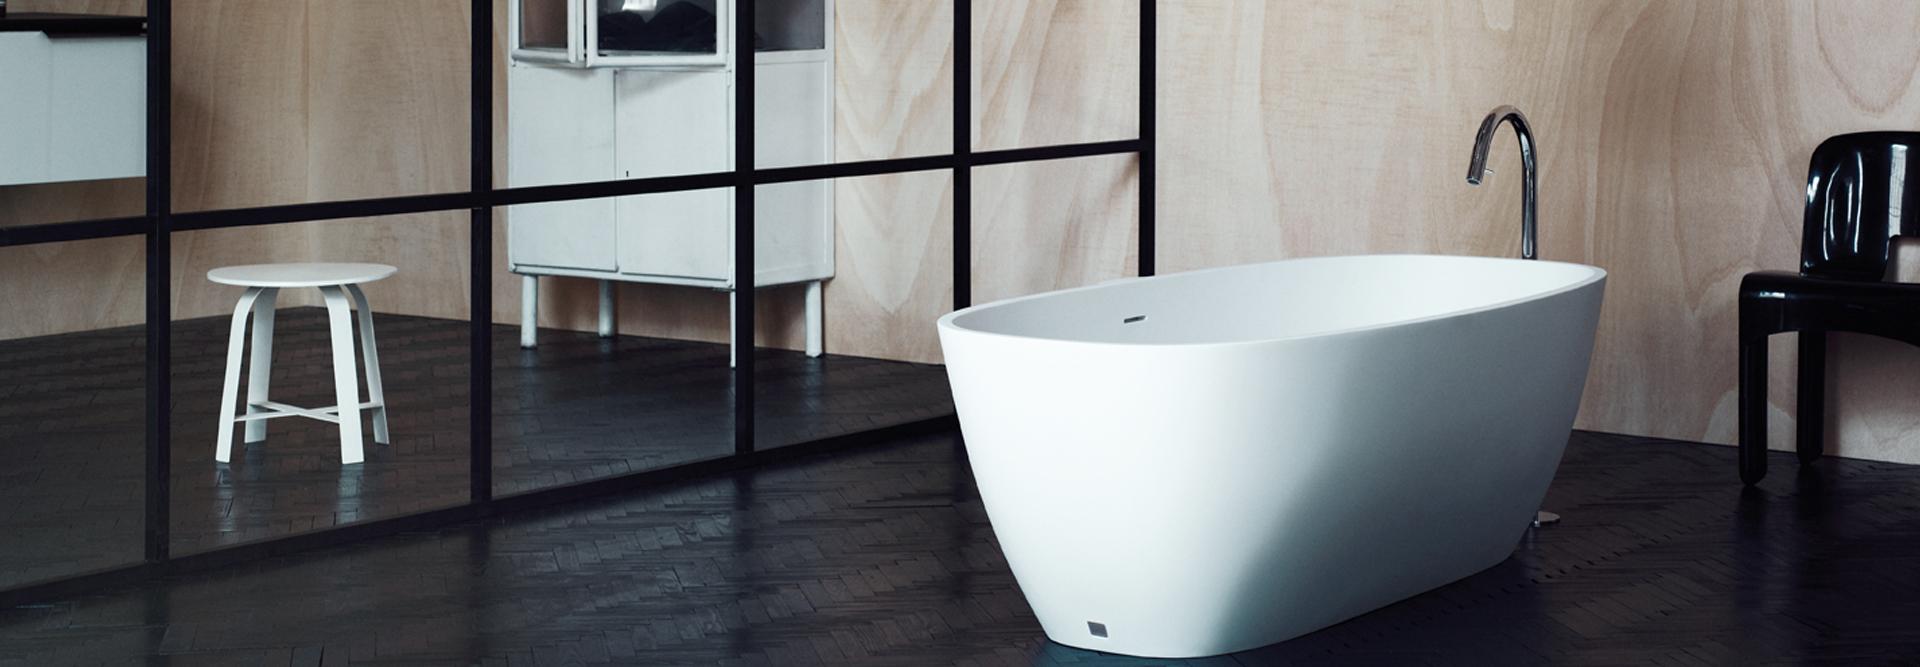 Agape sjartec badkamers wellness en tegels in leiden - Badkamer modellen ...